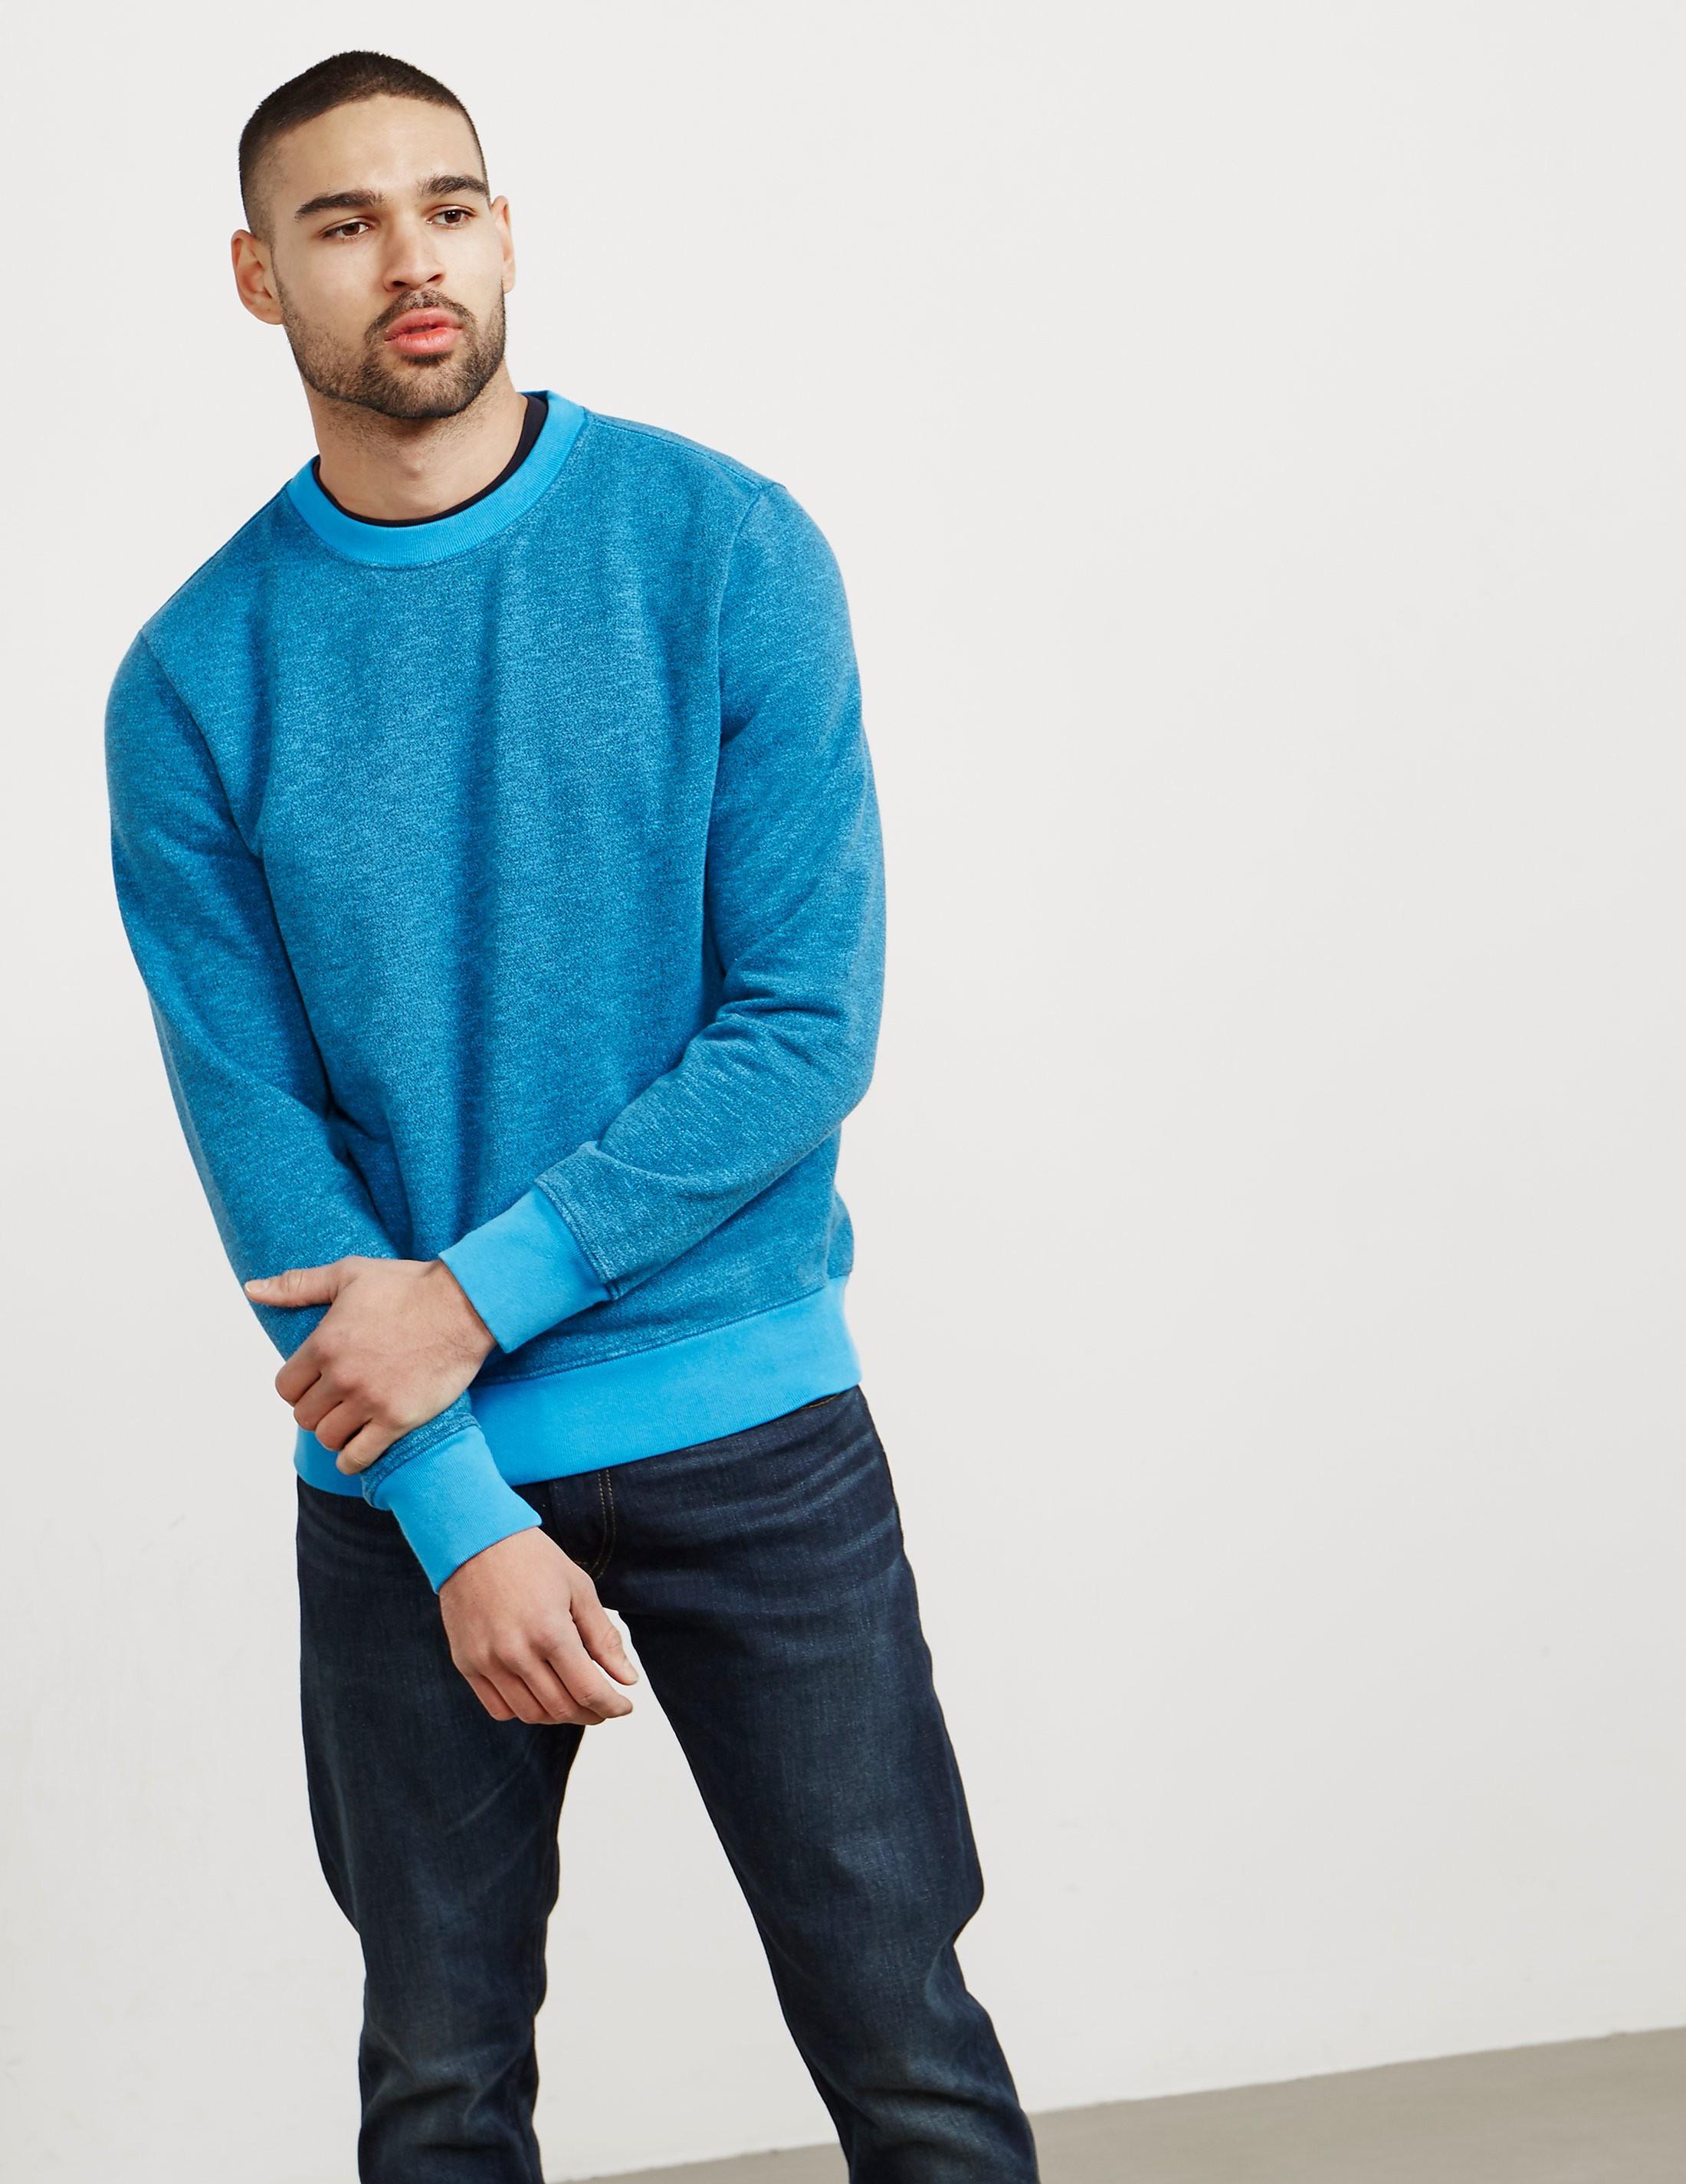 Paul Smith Garment Dyed Crew Sweatshirt